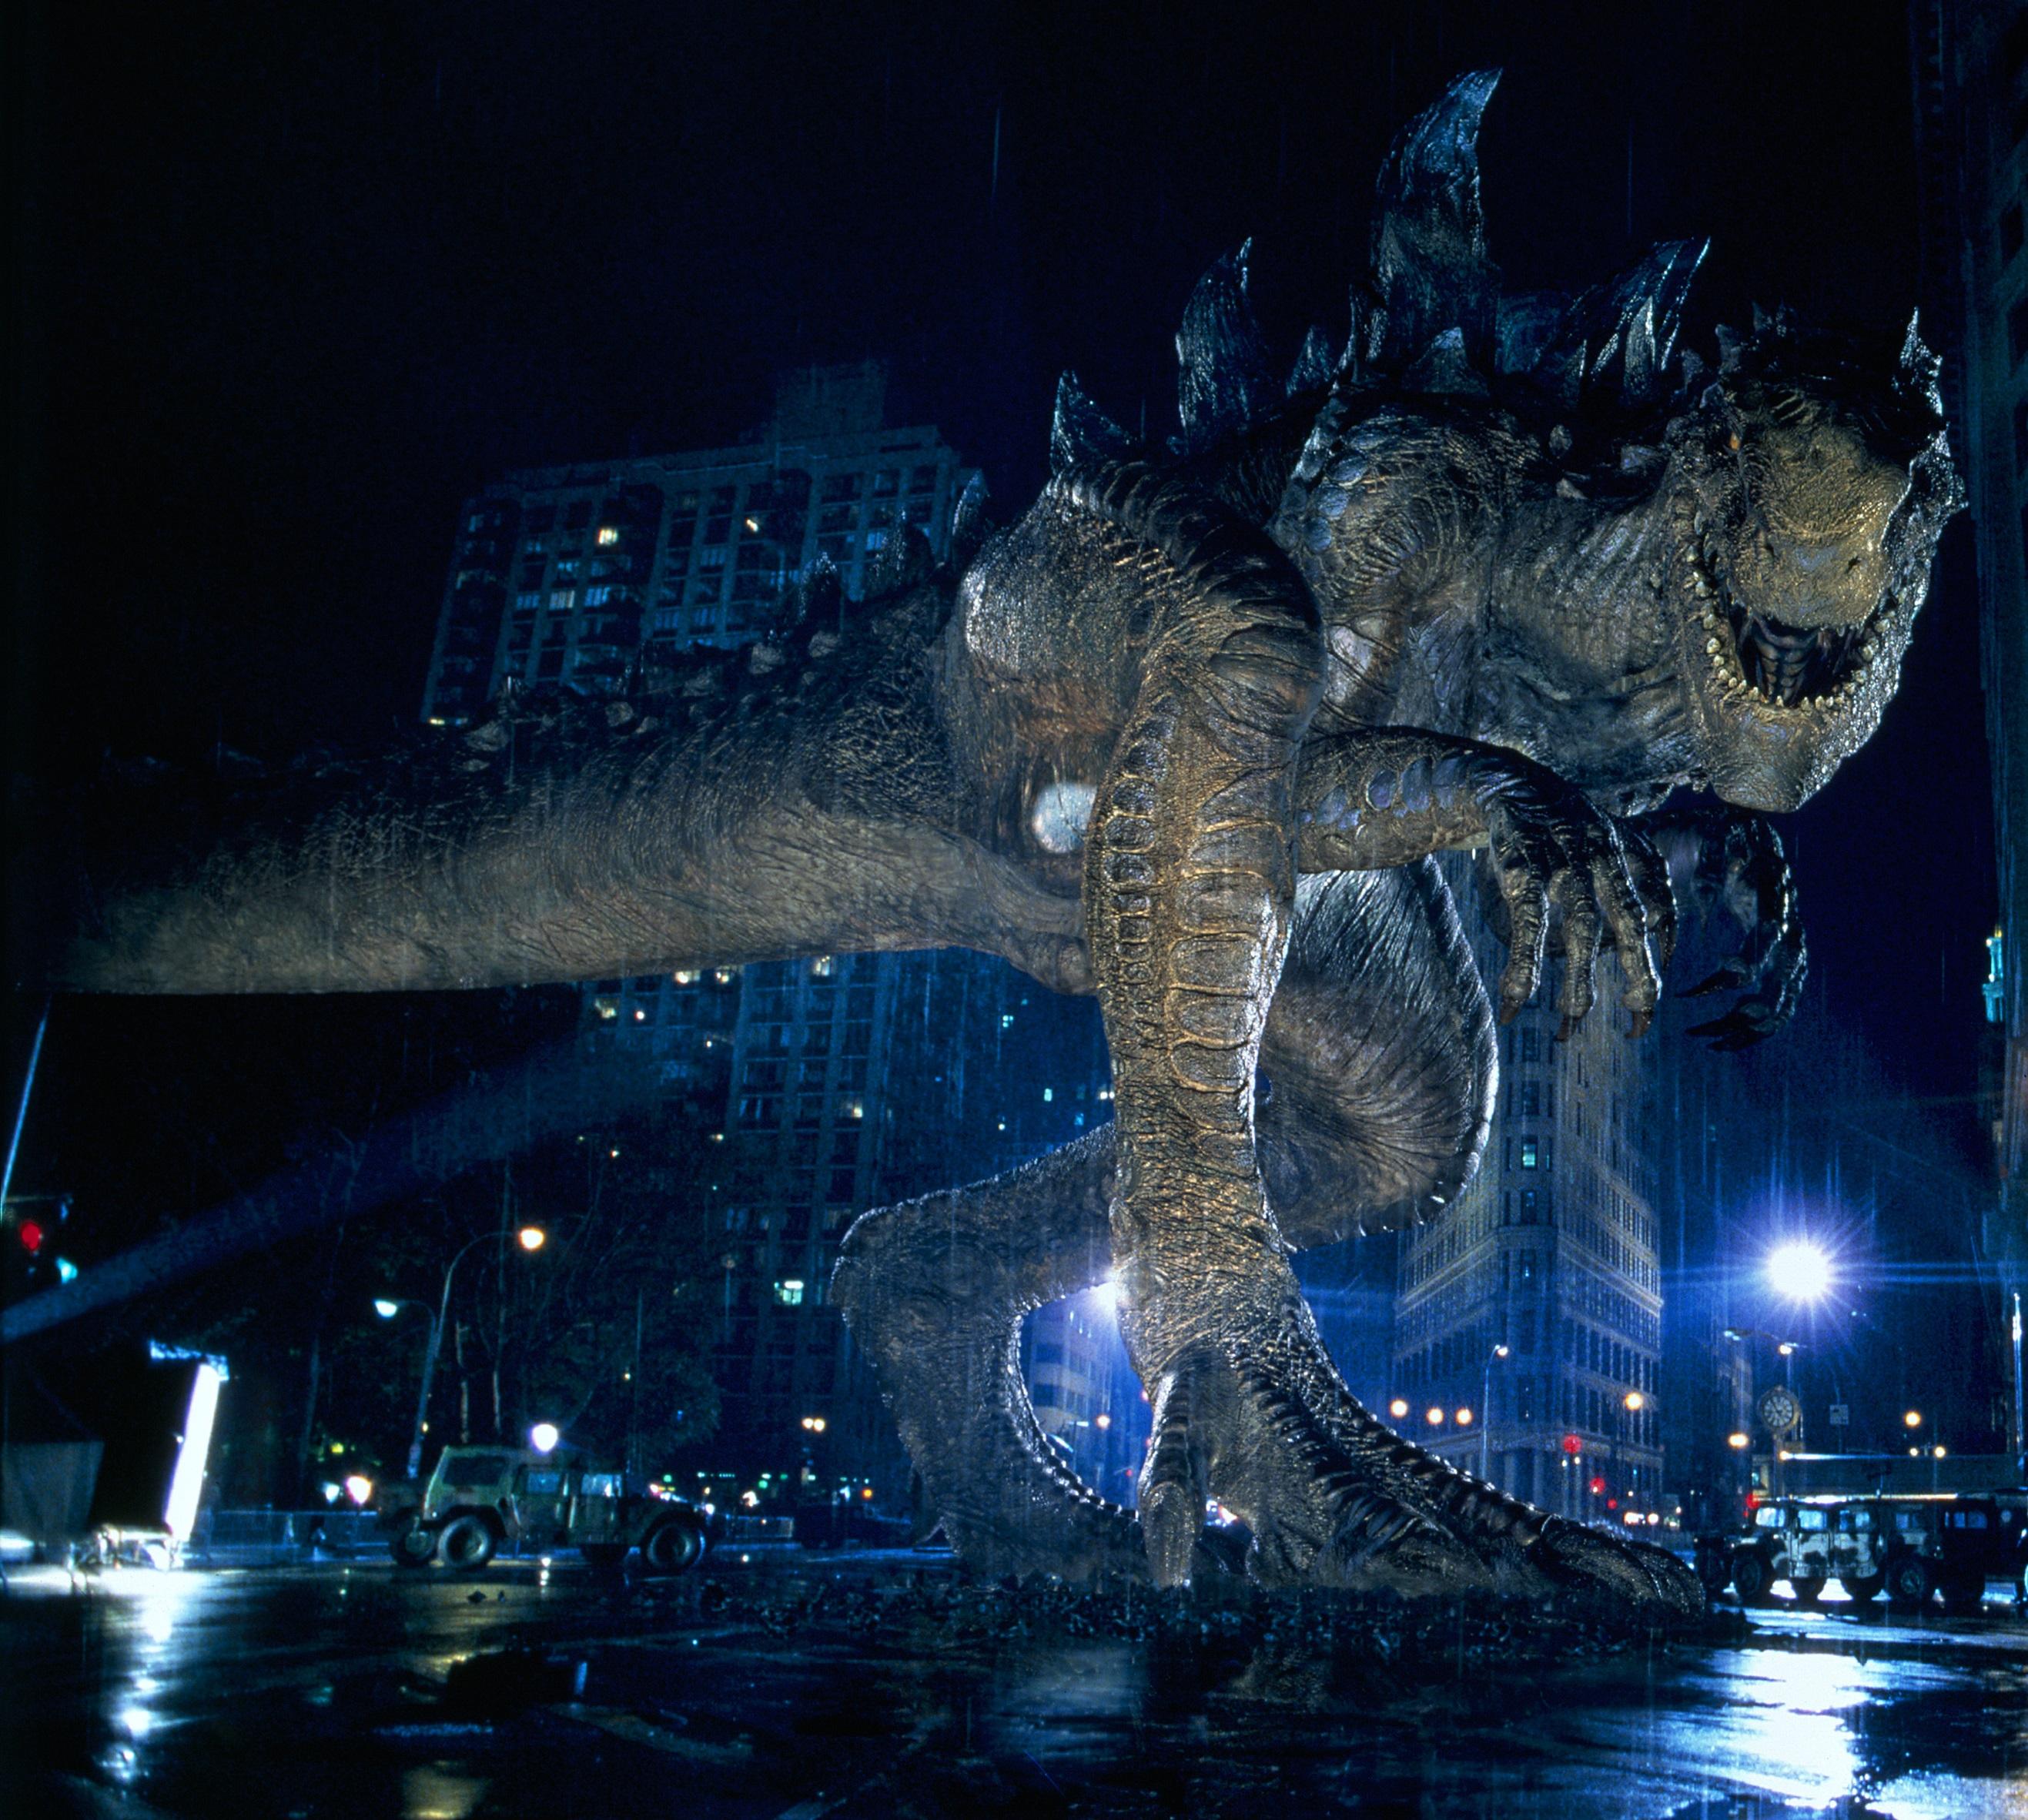 http://images3.wikia.nocookie.net/godzilla/images/d/d3/Godzilla98.jpg